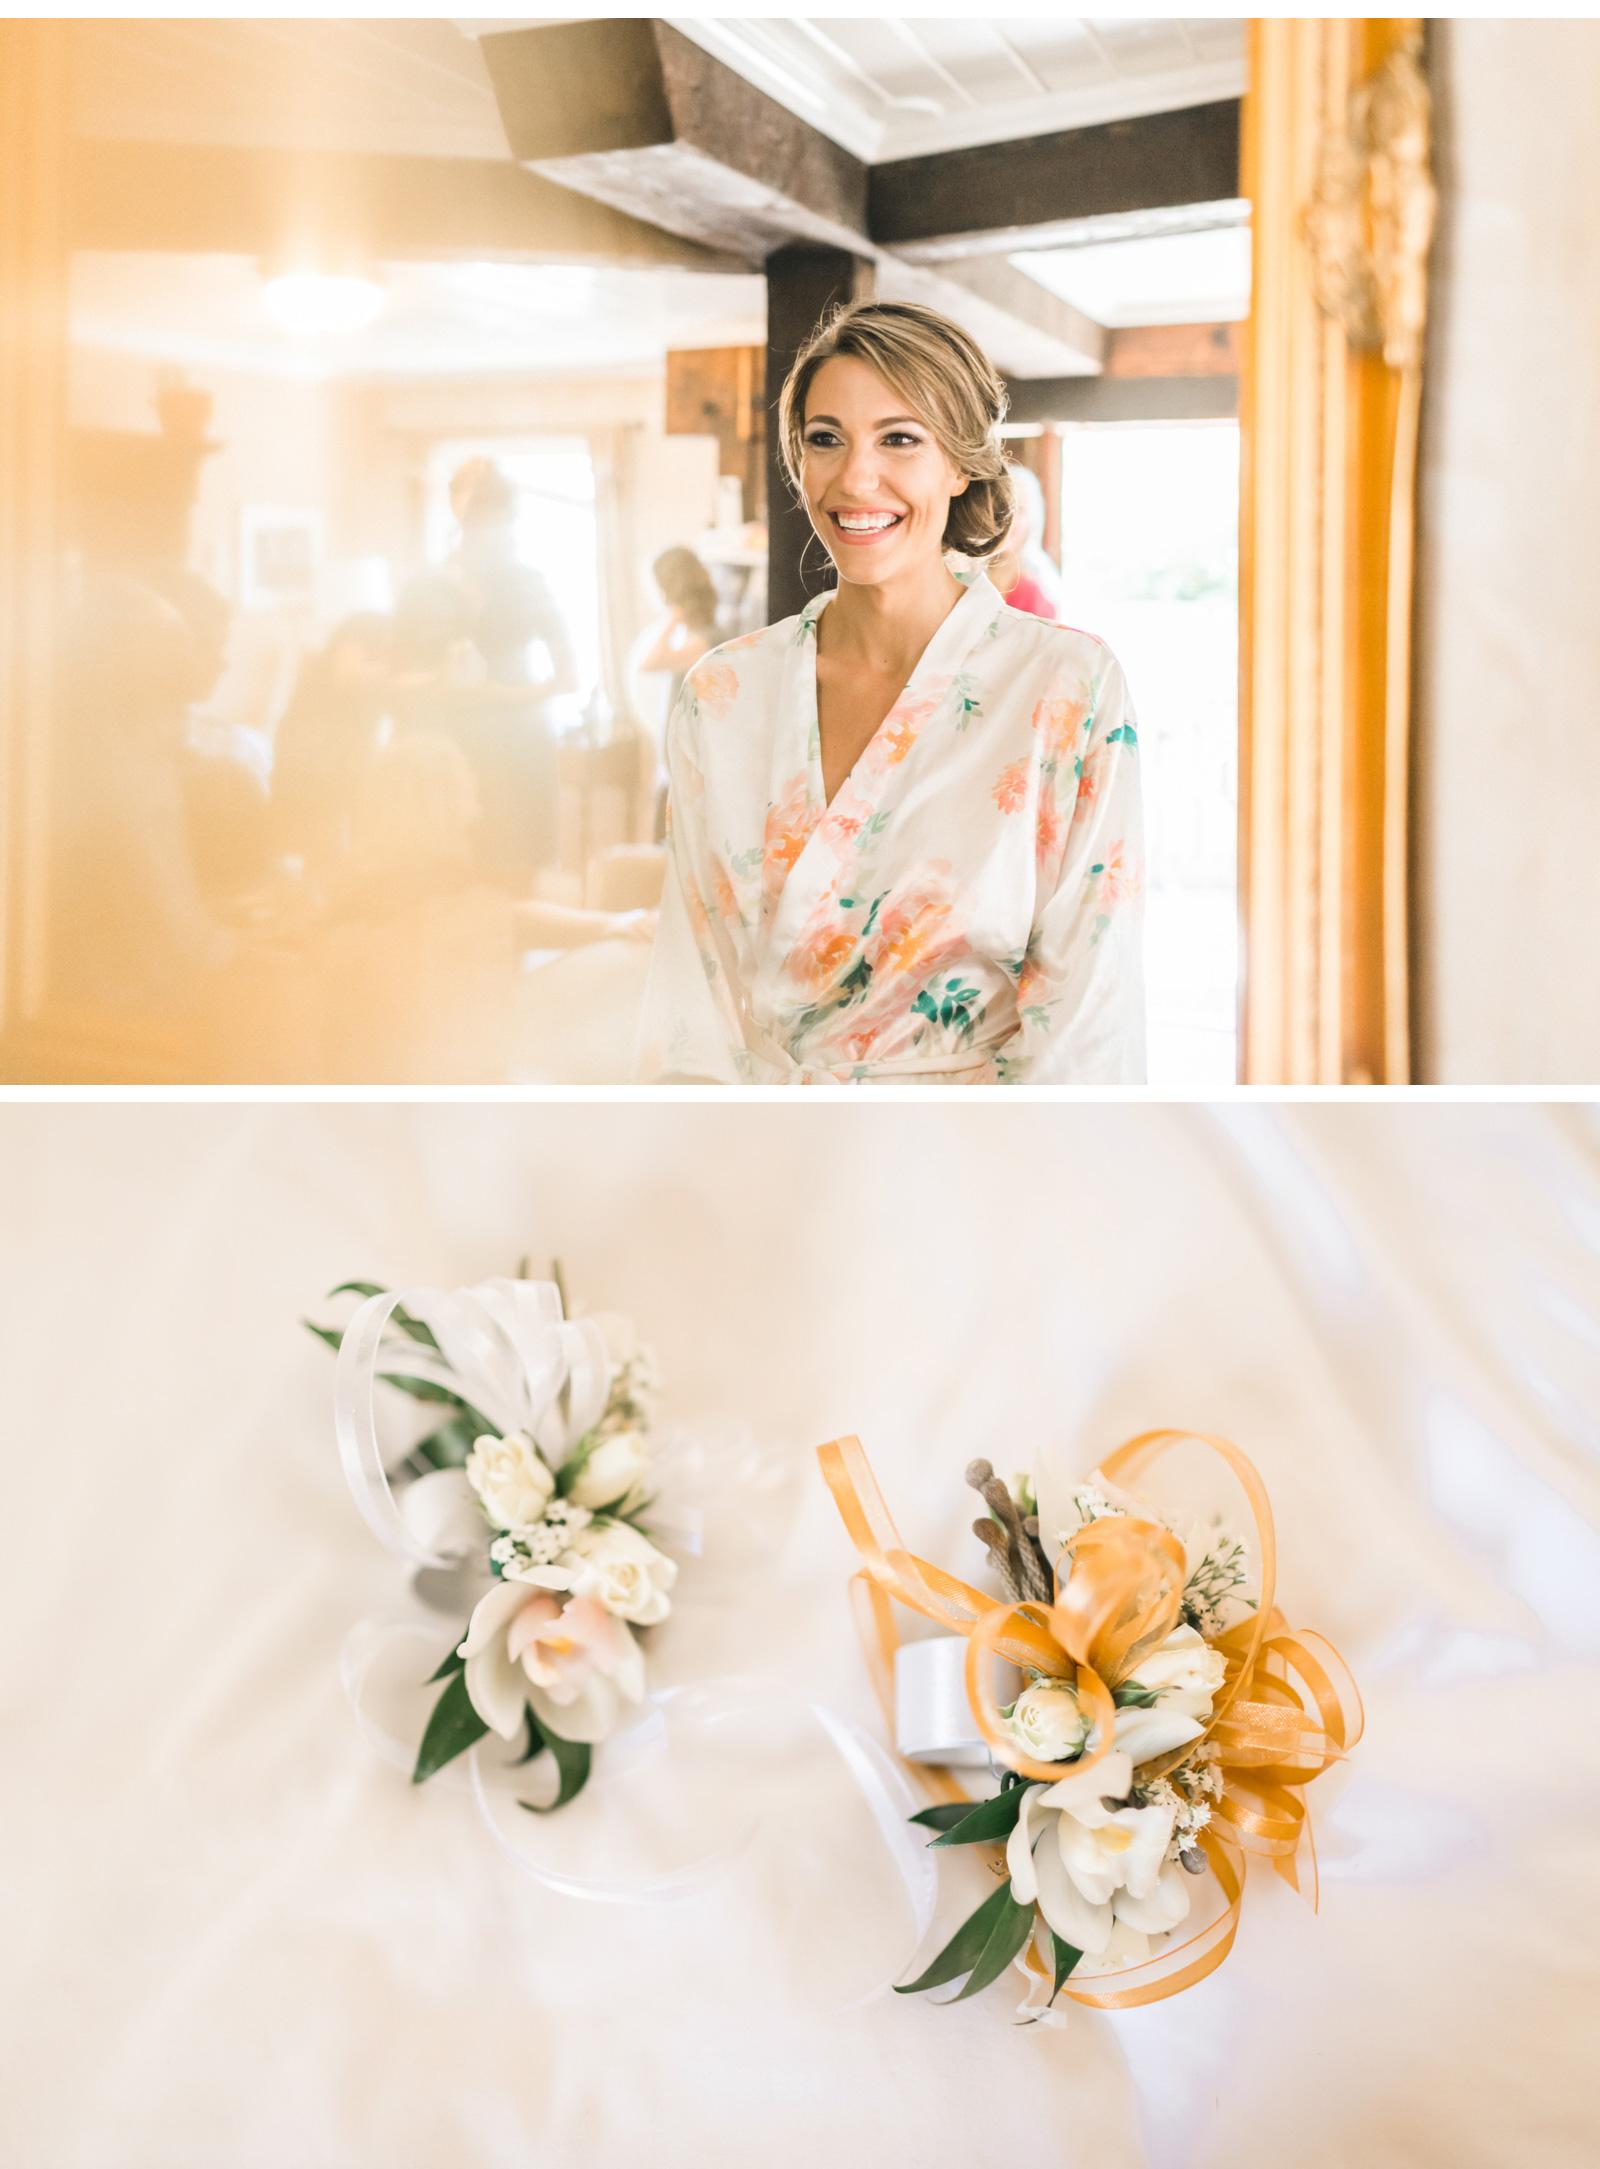 Mendocino-wedding-photographer-natalie-schutt-photography_03.jpg